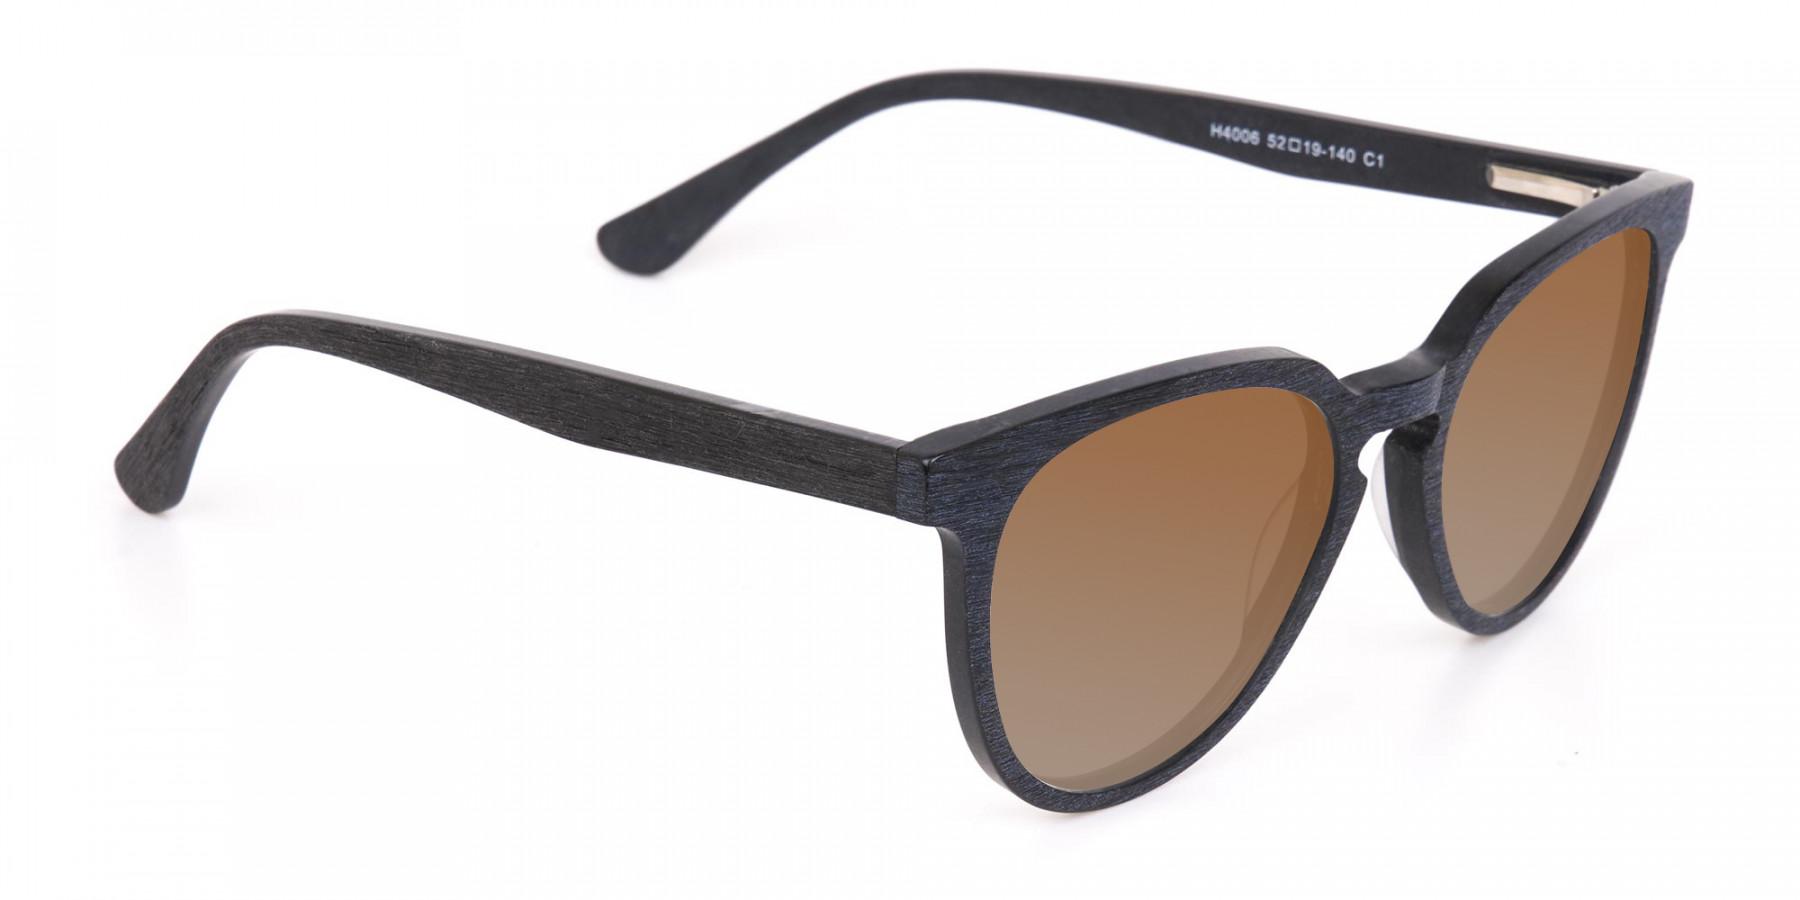 Black Wood Sunglasses with Dark Brown Tint - 3